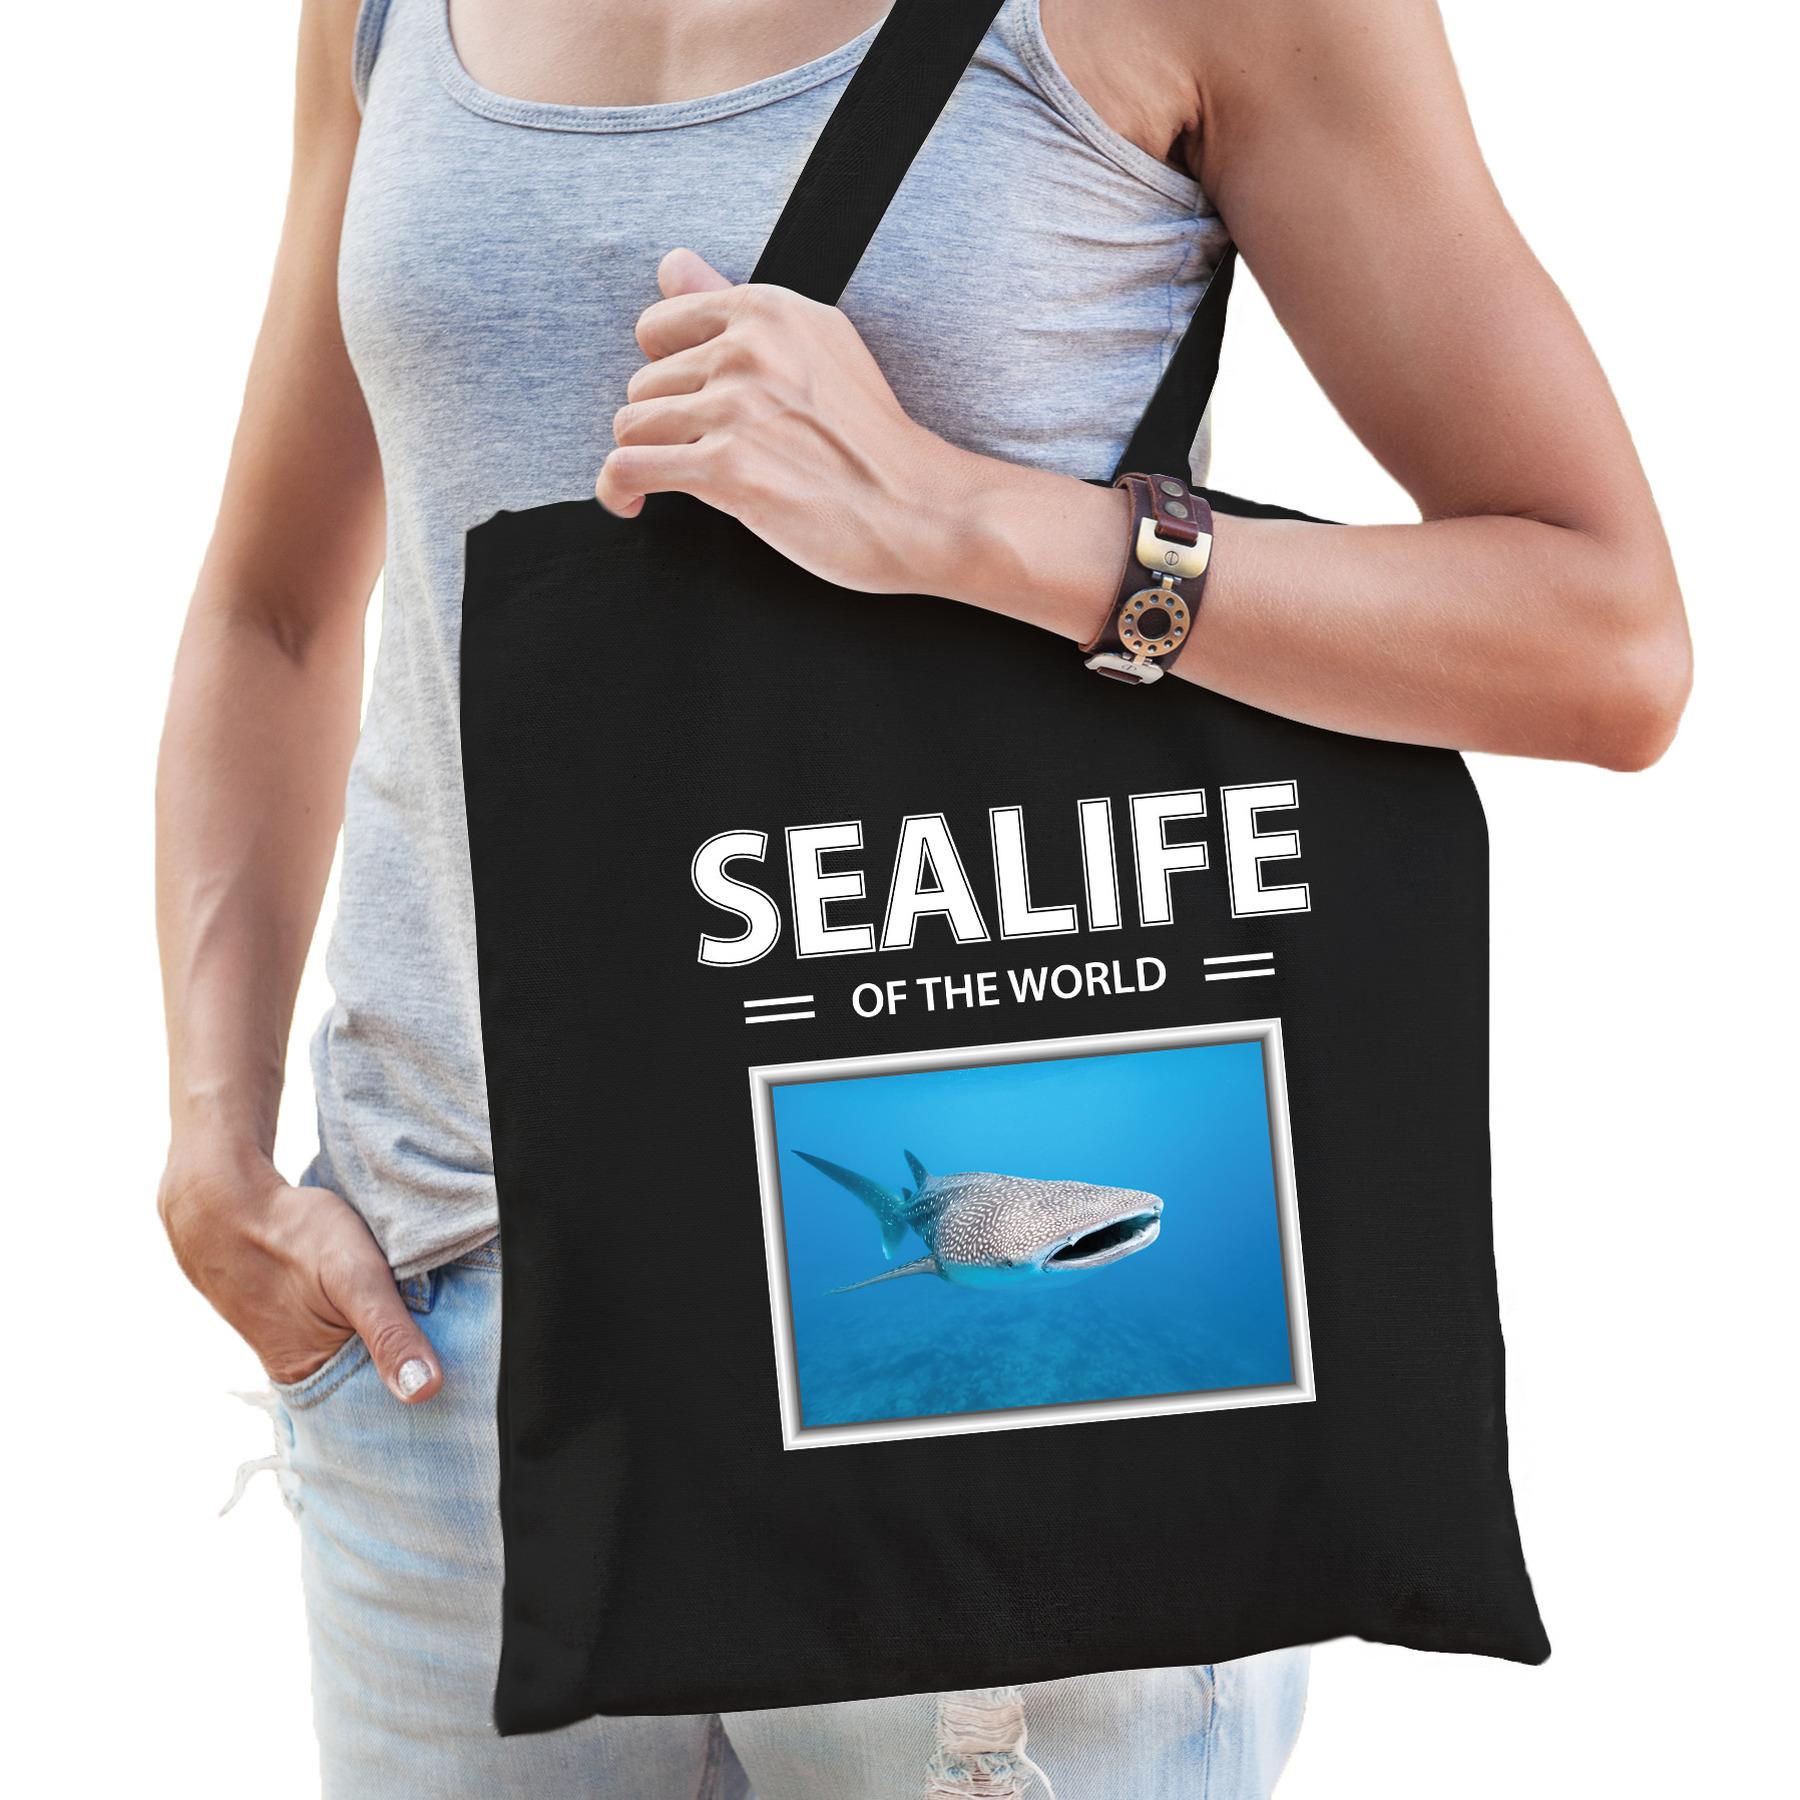 Katoenen tasje Tijgerhaai zwart - sealife of the world Haaien cadeau tas